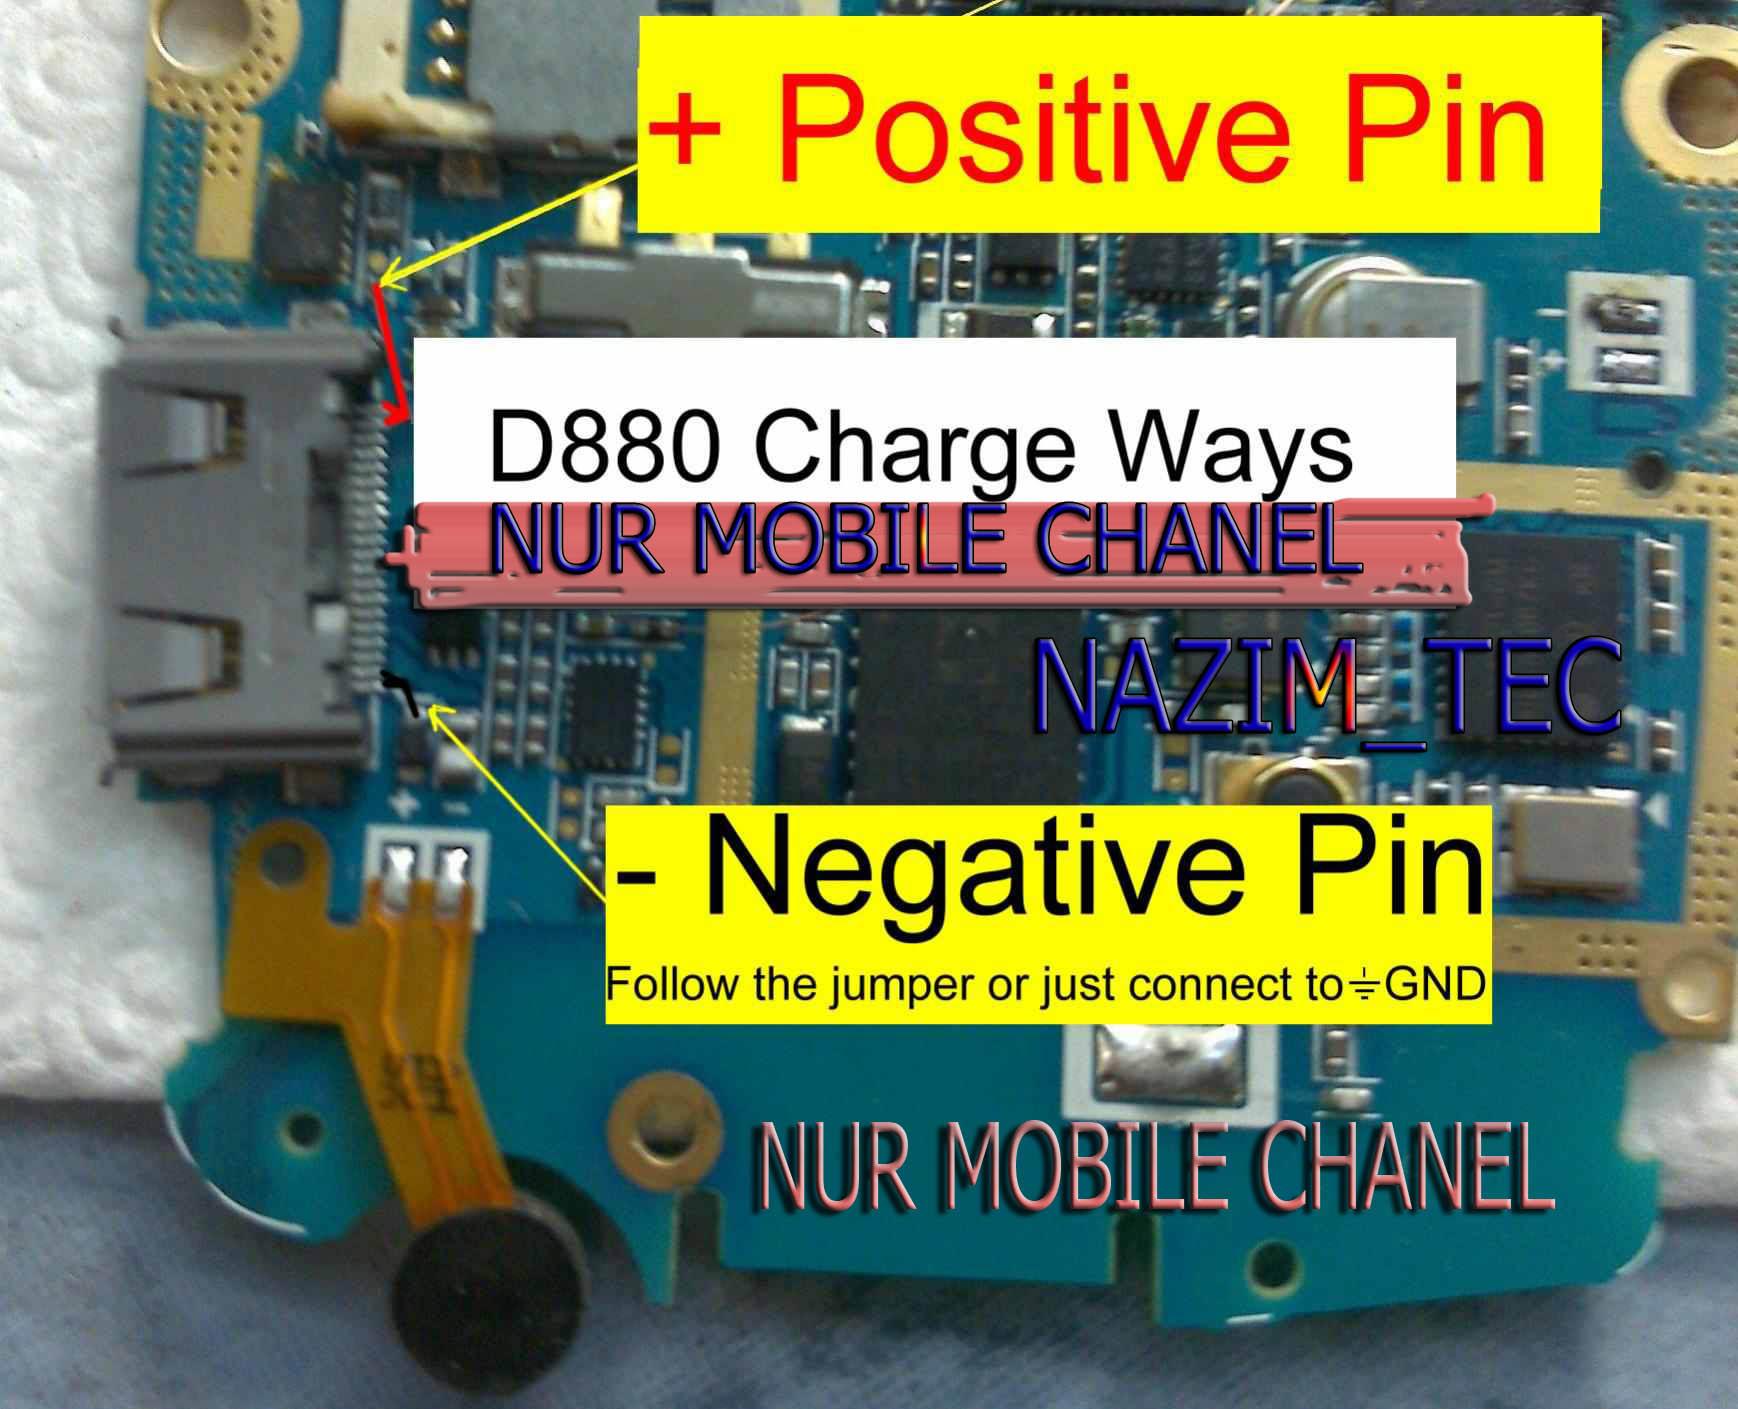 جهاز d 880